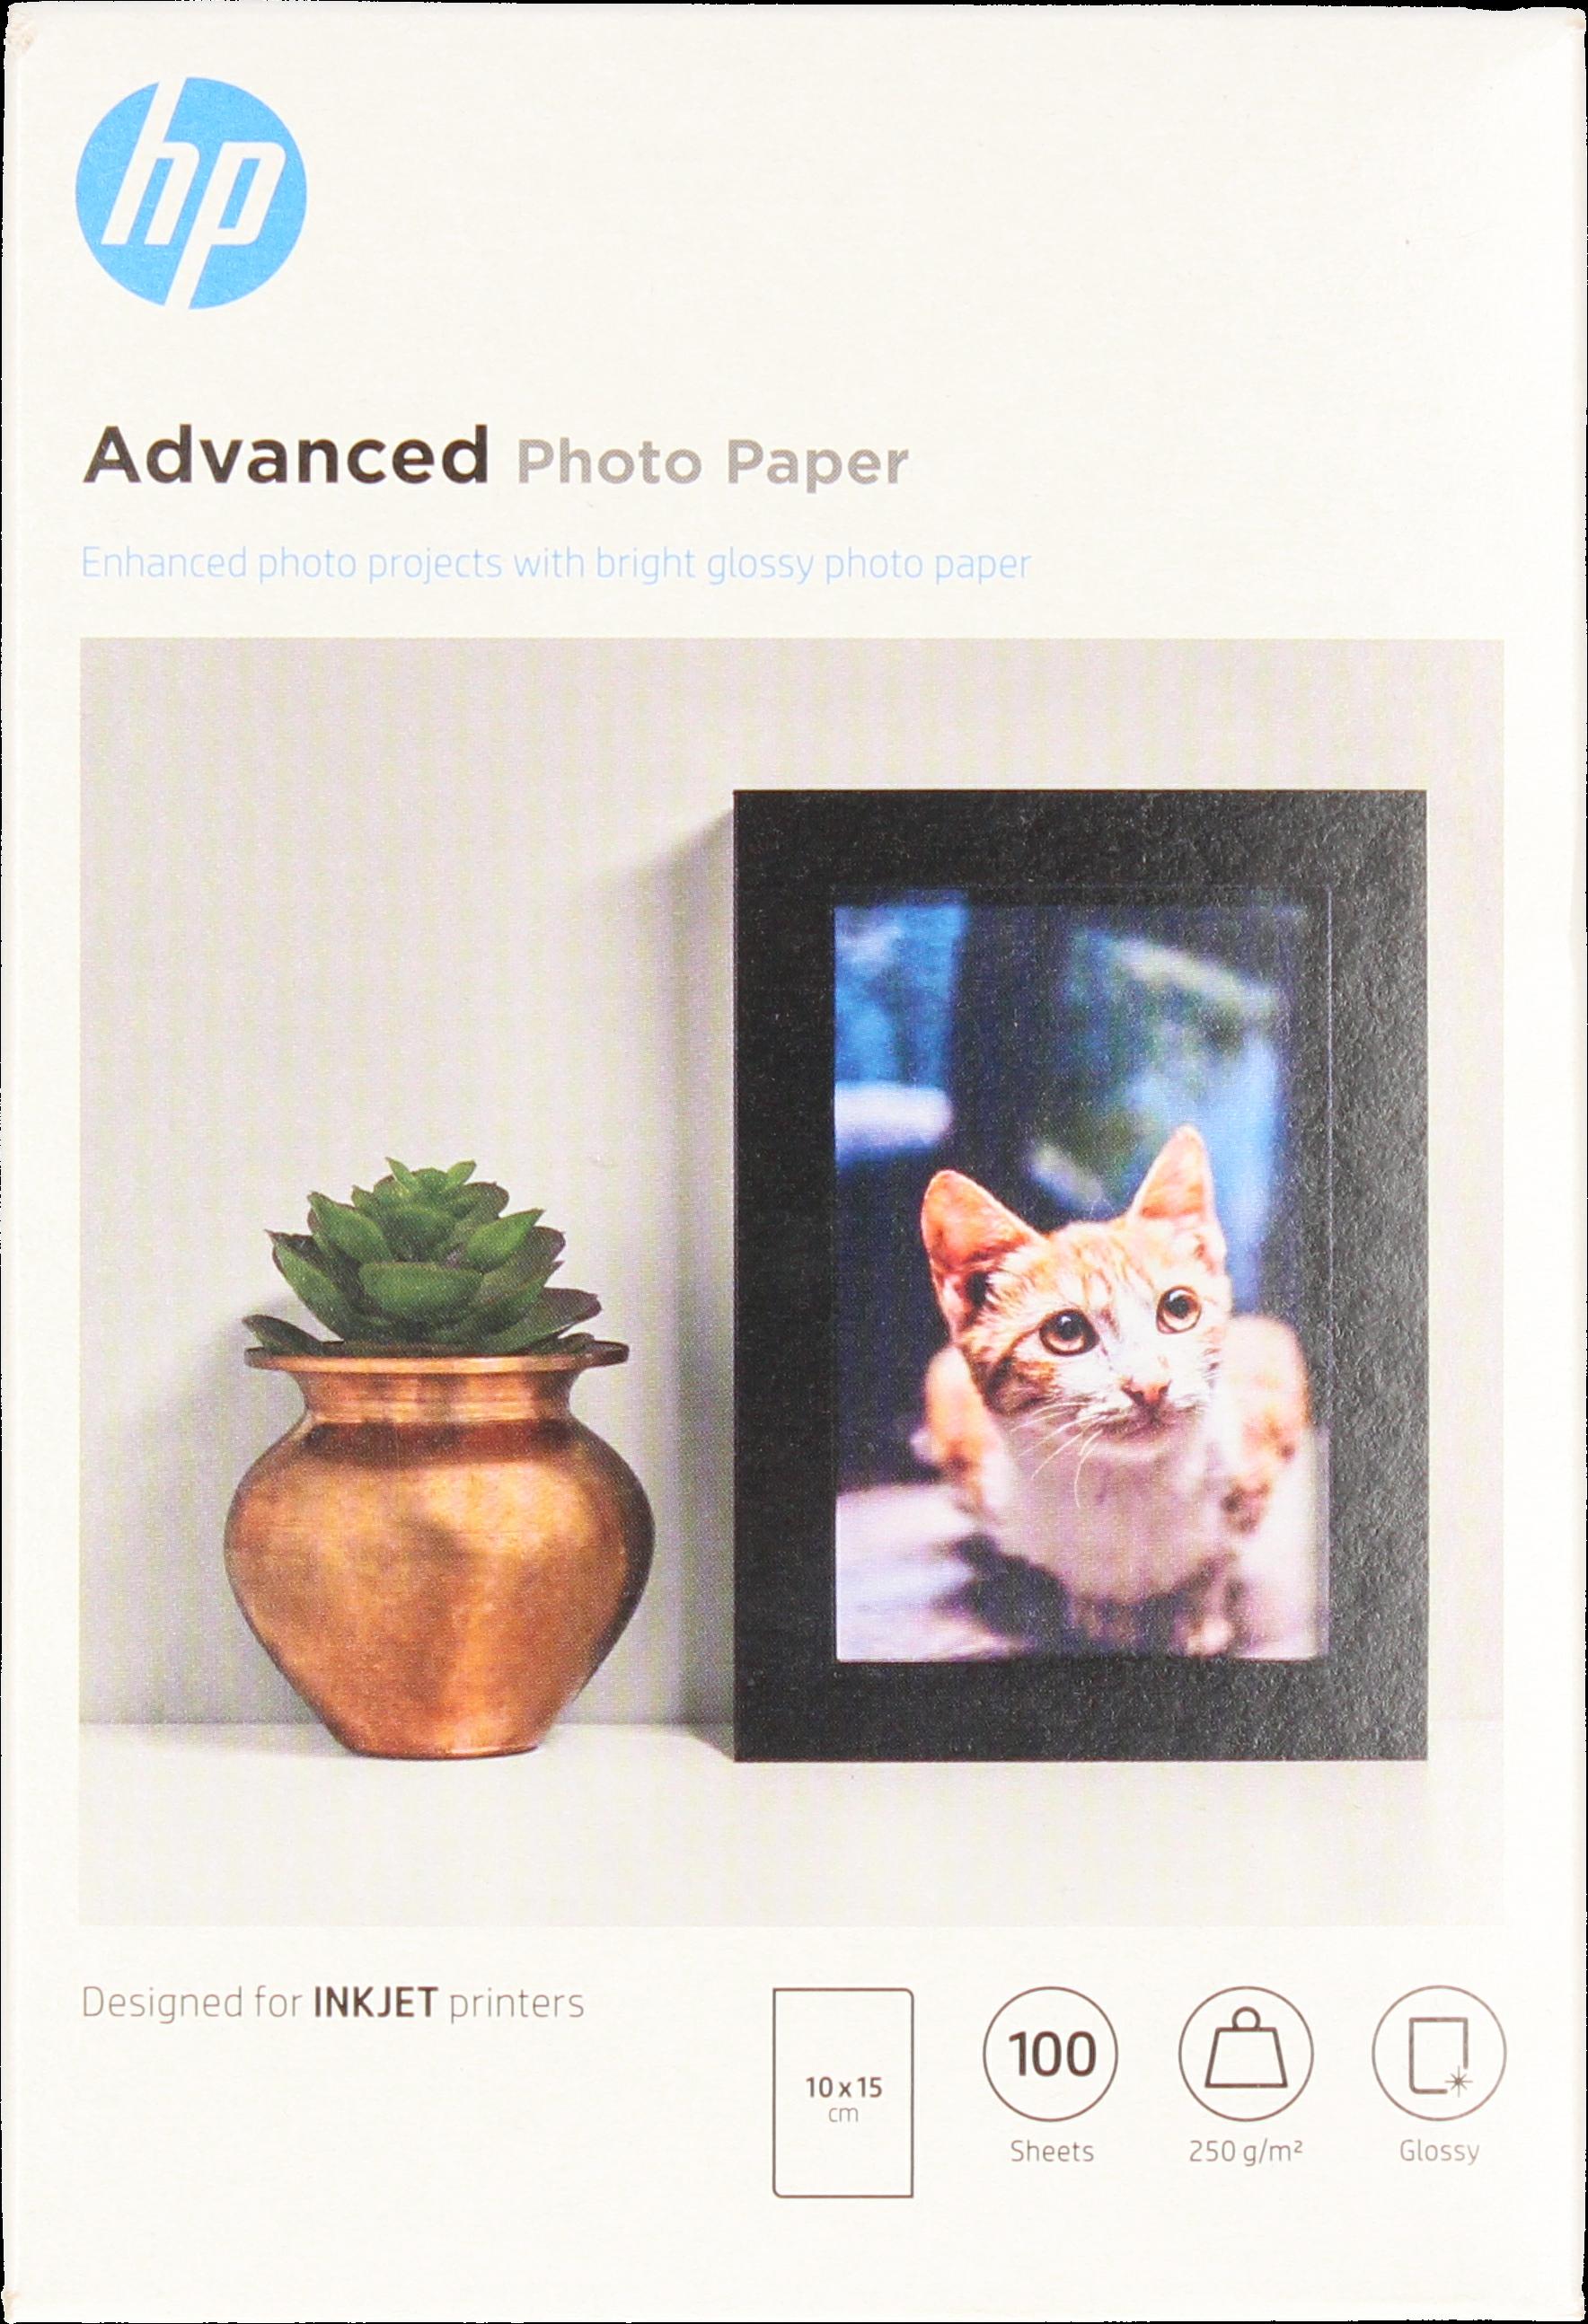 HP  Advanced fotopapier Glans | 10x15 | 250 gr/m² 100 vellen